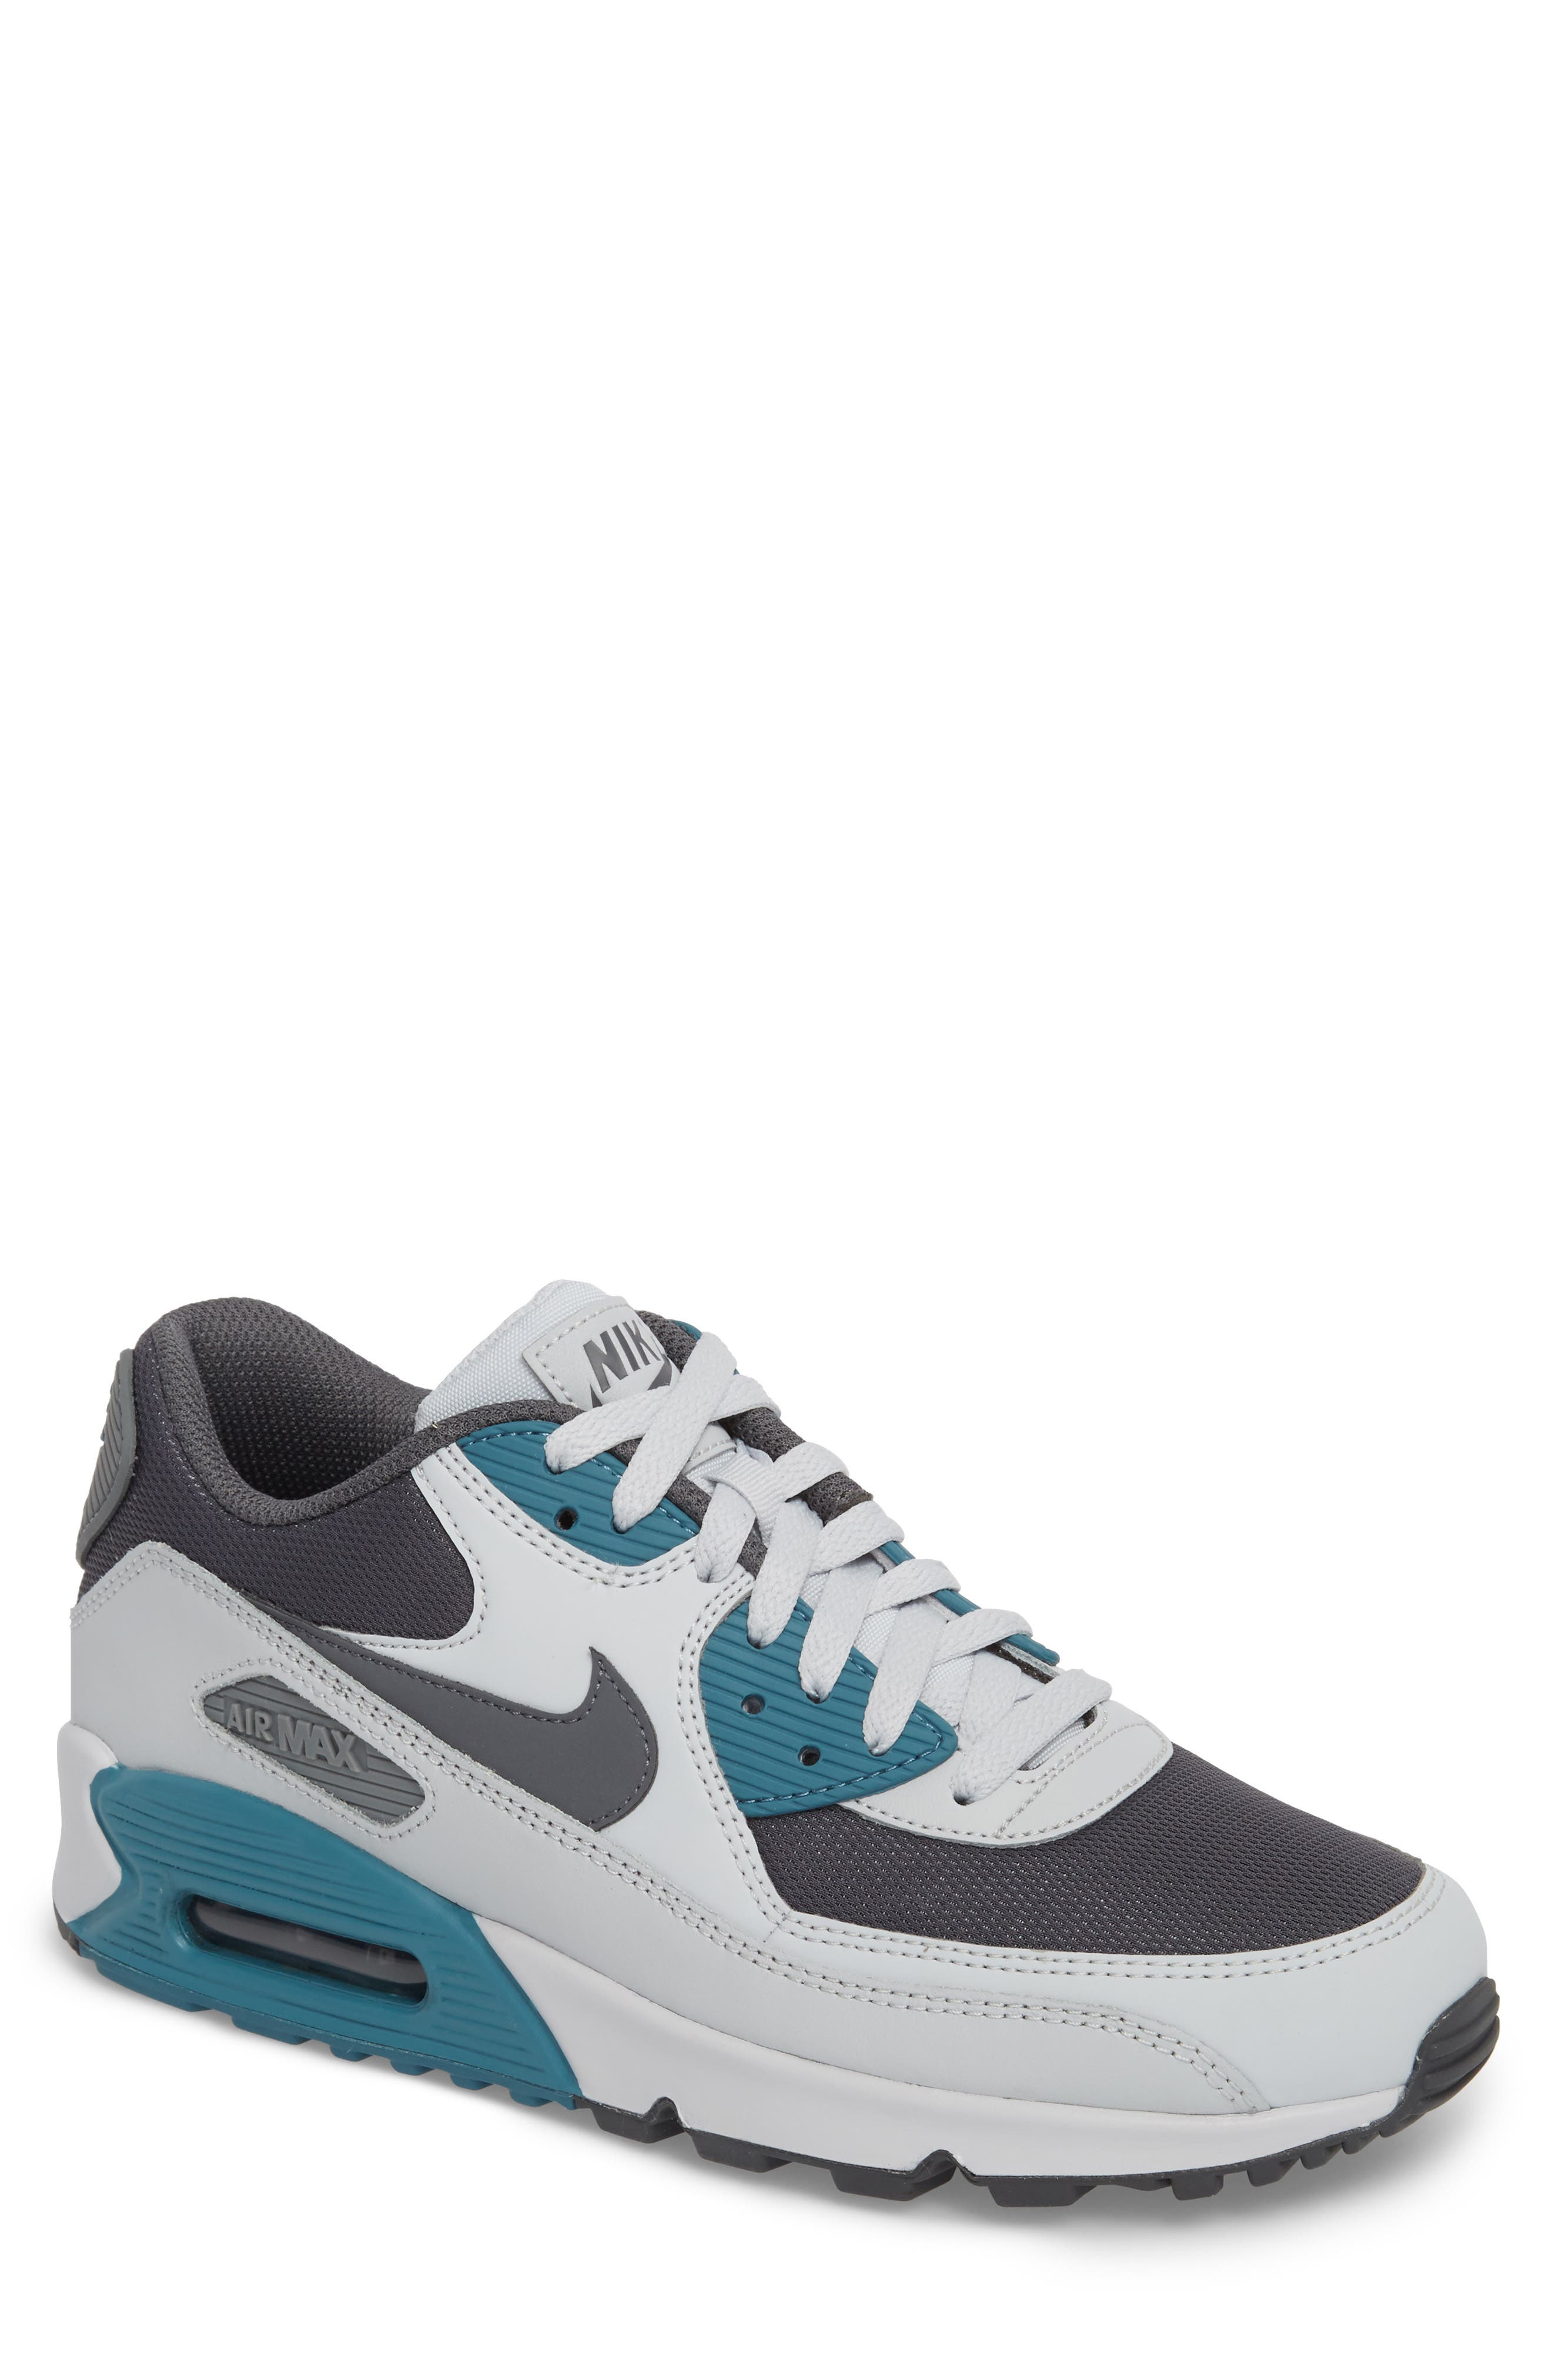 'Air Max 90 Essential' Sneaker,                         Main,                         color, Pure Platinum/ Cool Grey/ Aqua